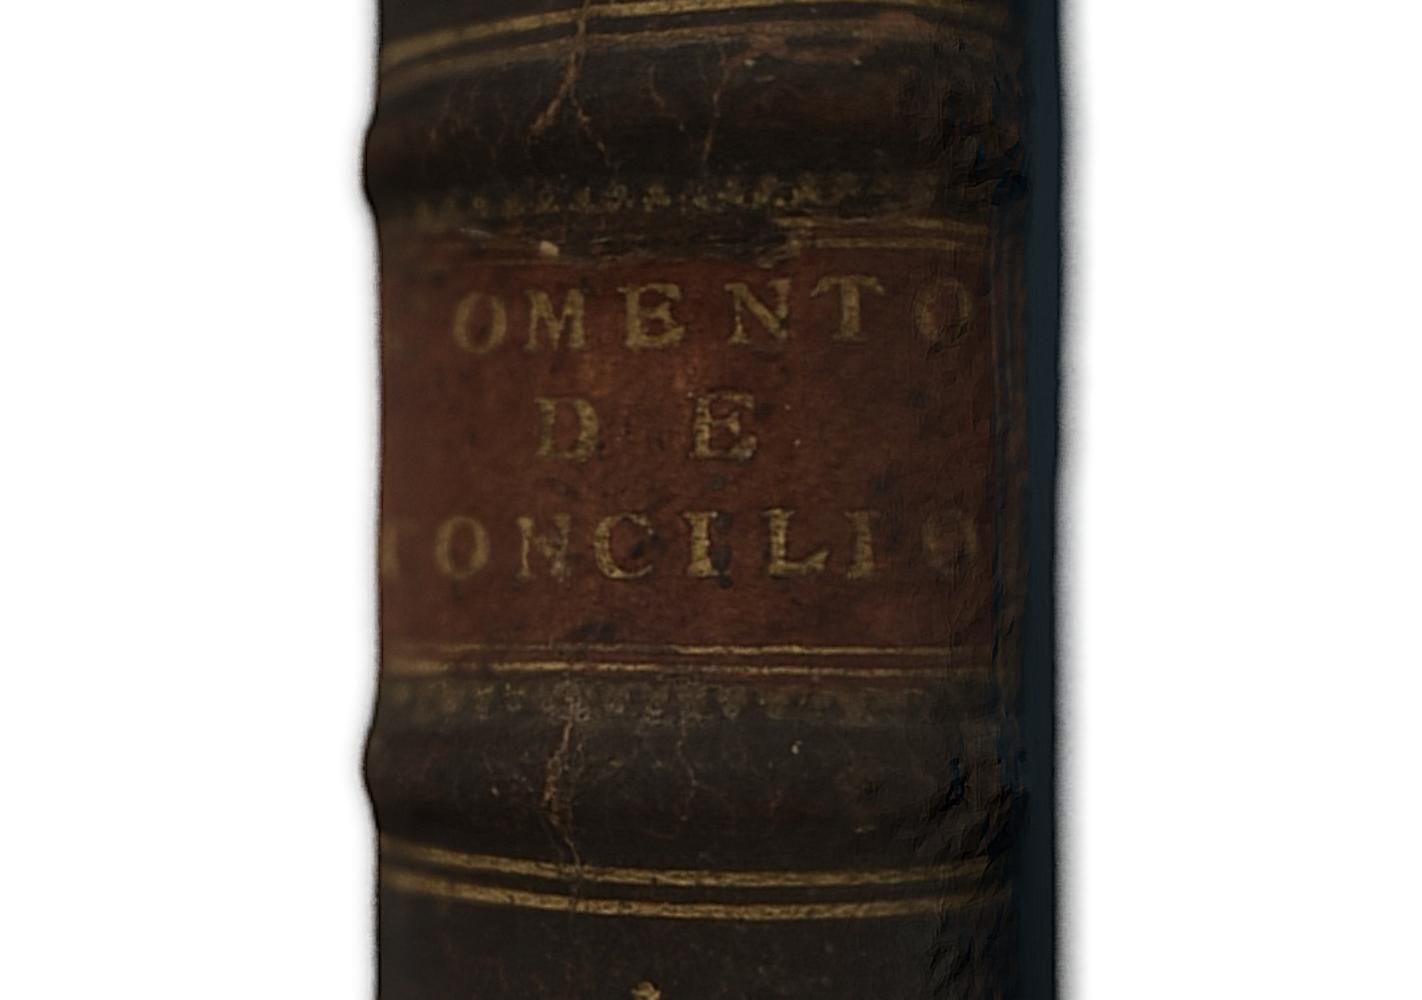 Capture d'écran 2017-11-13 à 18.23.27.png Download free STL file Book of 1739 of the Council of Trent • 3D printable template, MonteMorbase